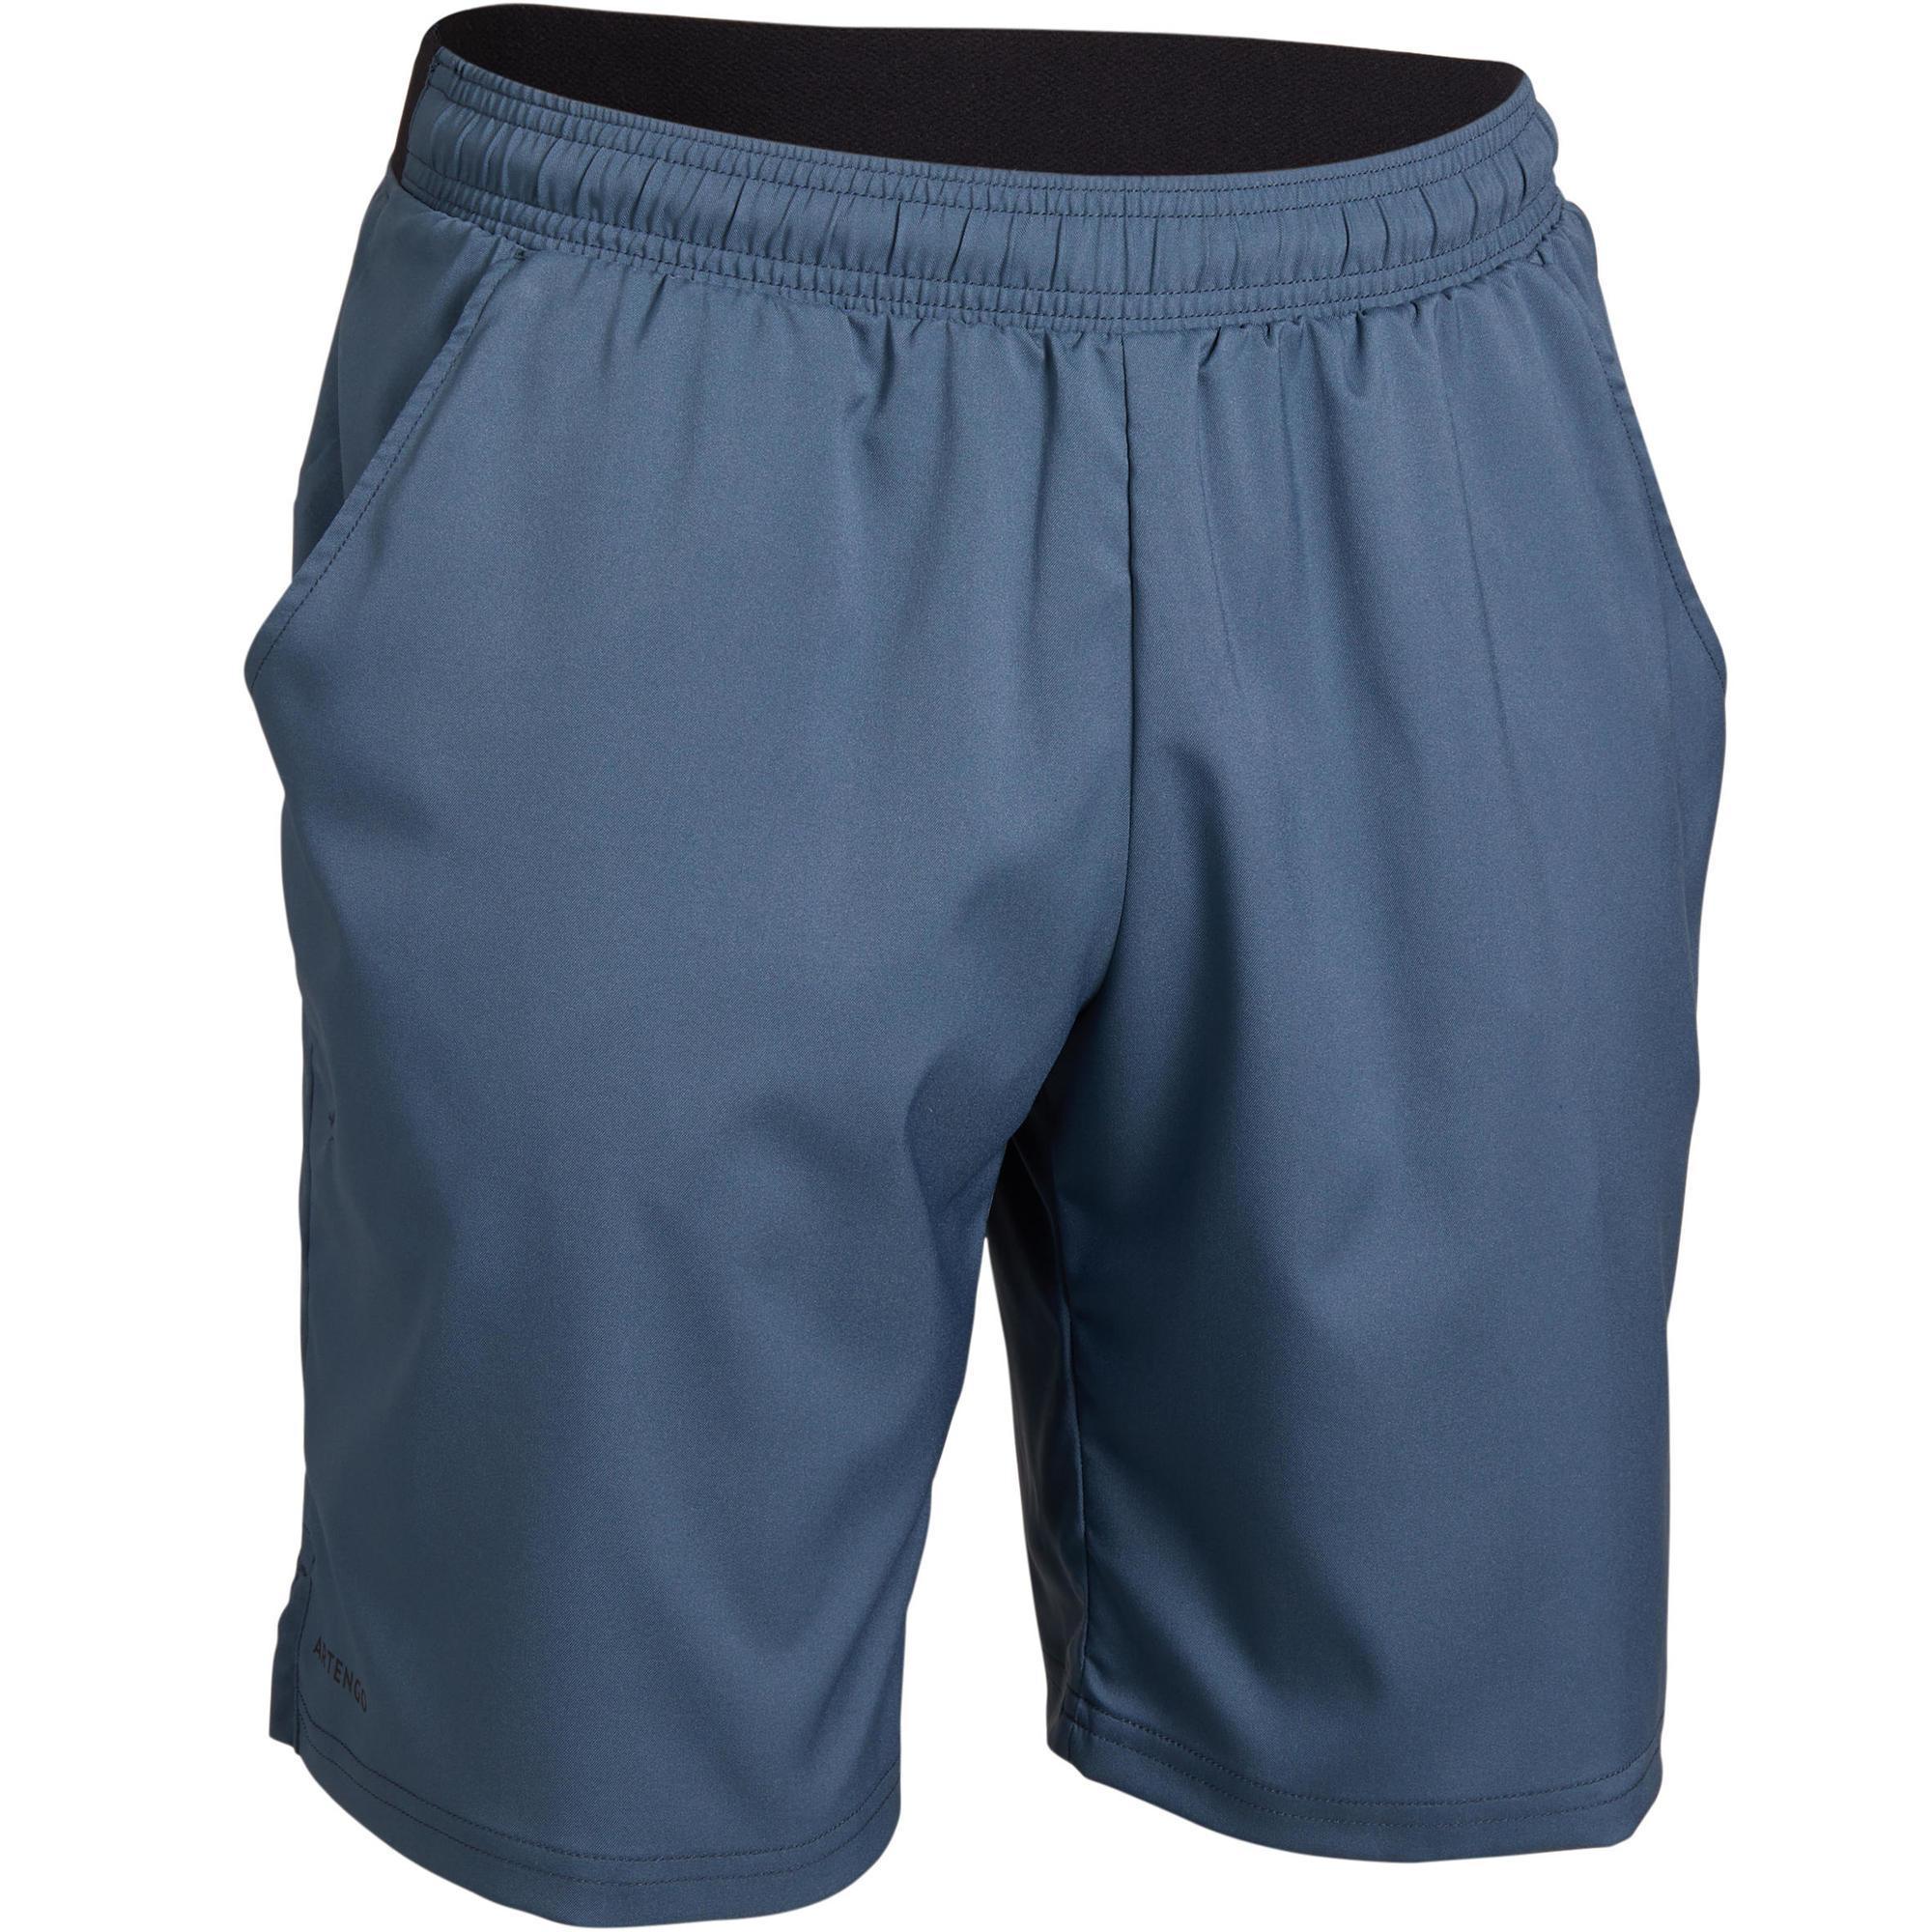 Tennis-Shorts Dry 500 Herren grau | Sportbekleidung > Sporthosen > Tennisshorts | Grau - Blau - Schwarz | Artengo